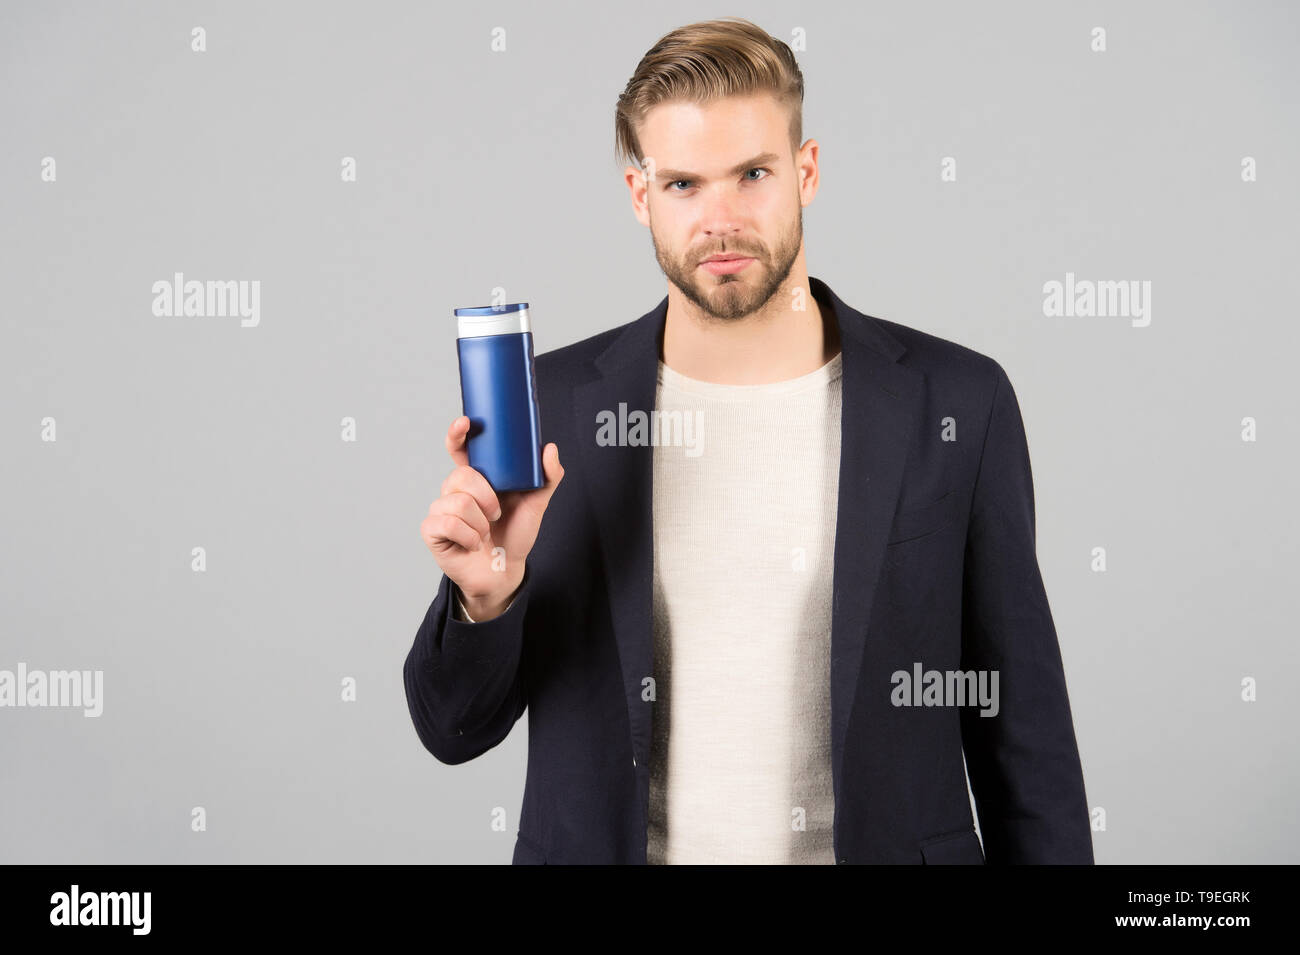 Man confident face holds shampoo bottle, grey background. Guy with bristle holds bottle shampoo, copy space. Man enjoy freshness after washing hair wi - Stock Image